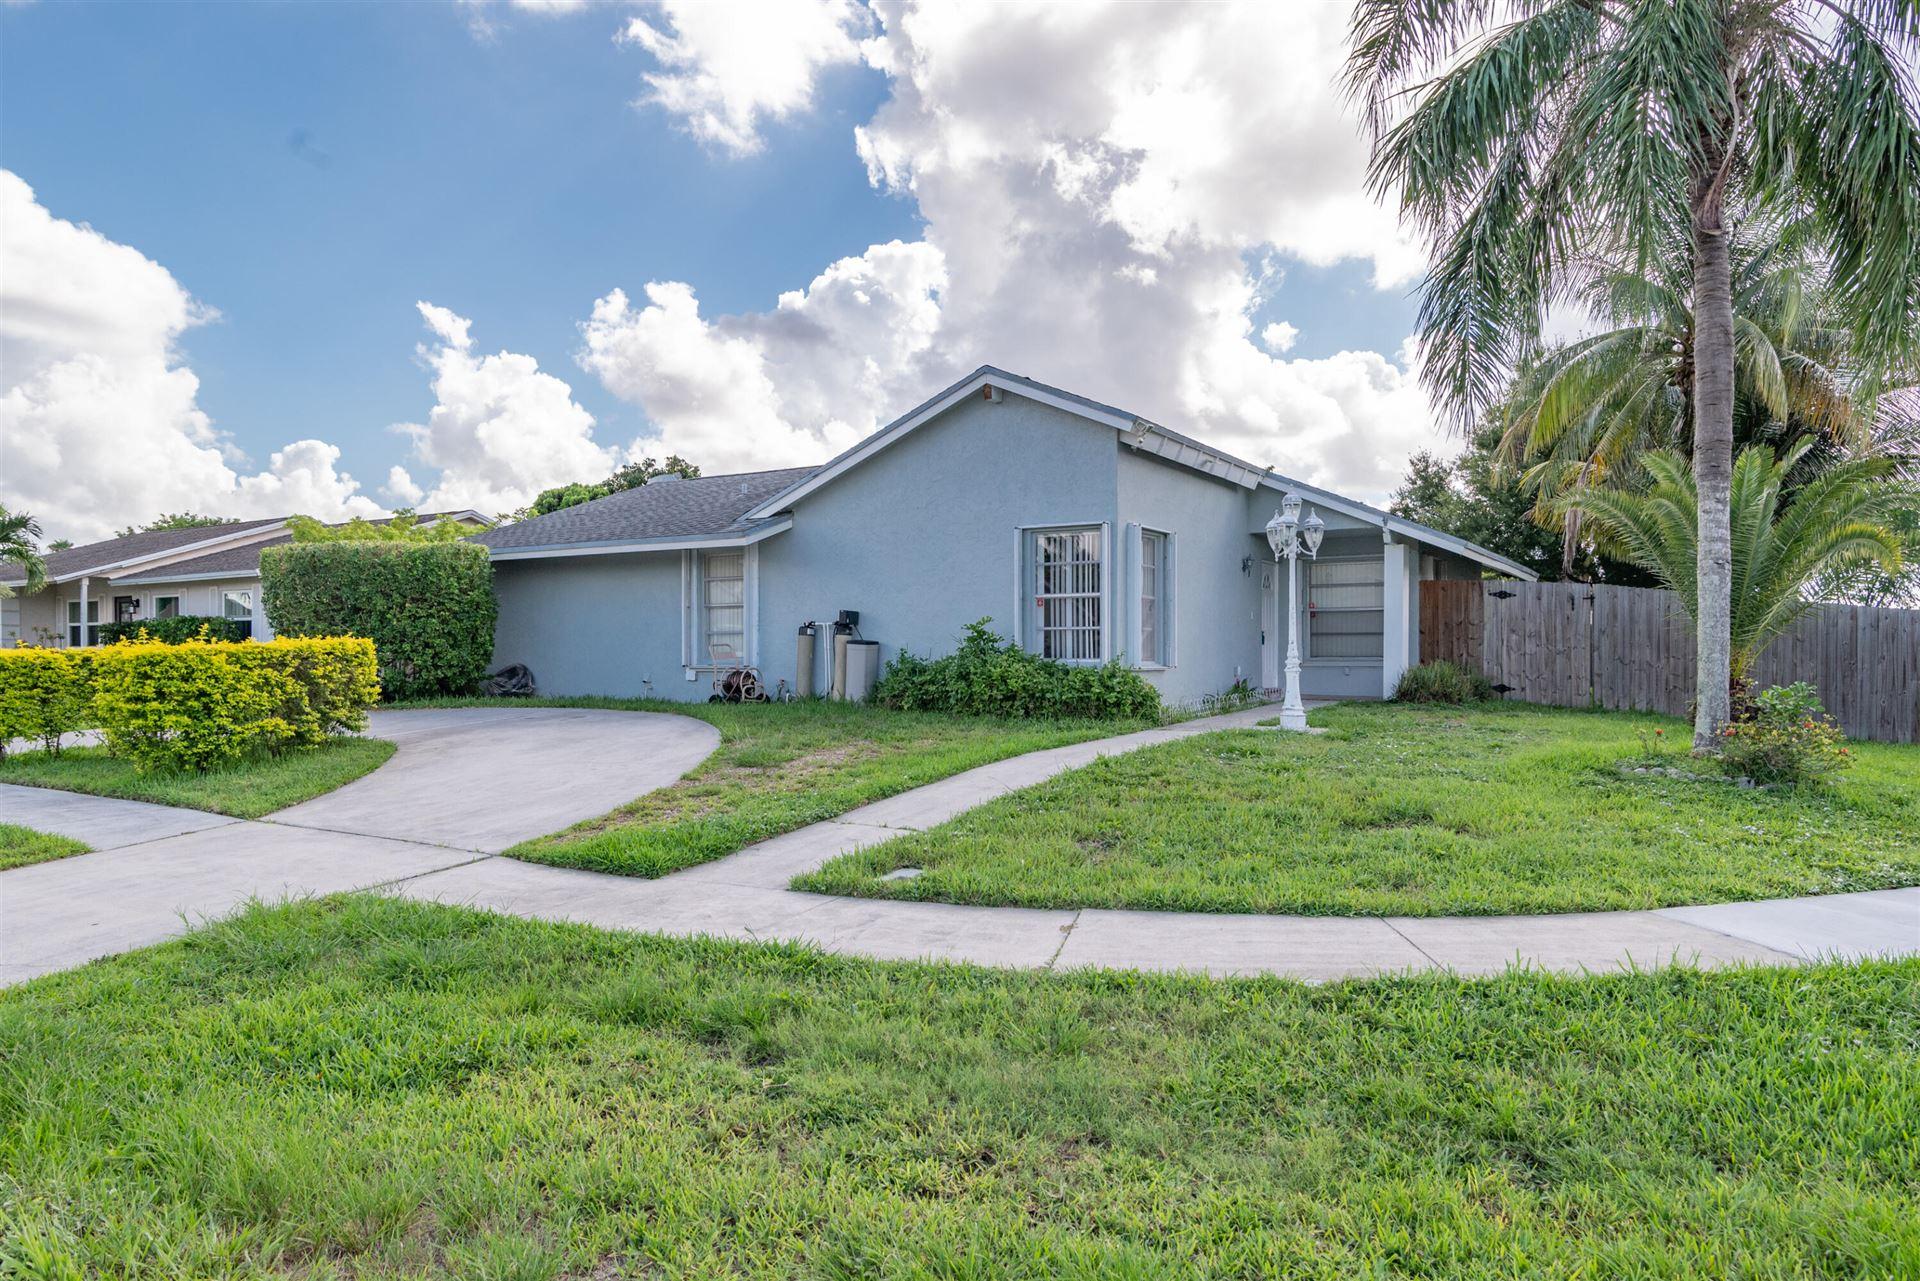 1034 Sonata Way, Royal Palm Beach, FL 33411 - #: RX-10732682